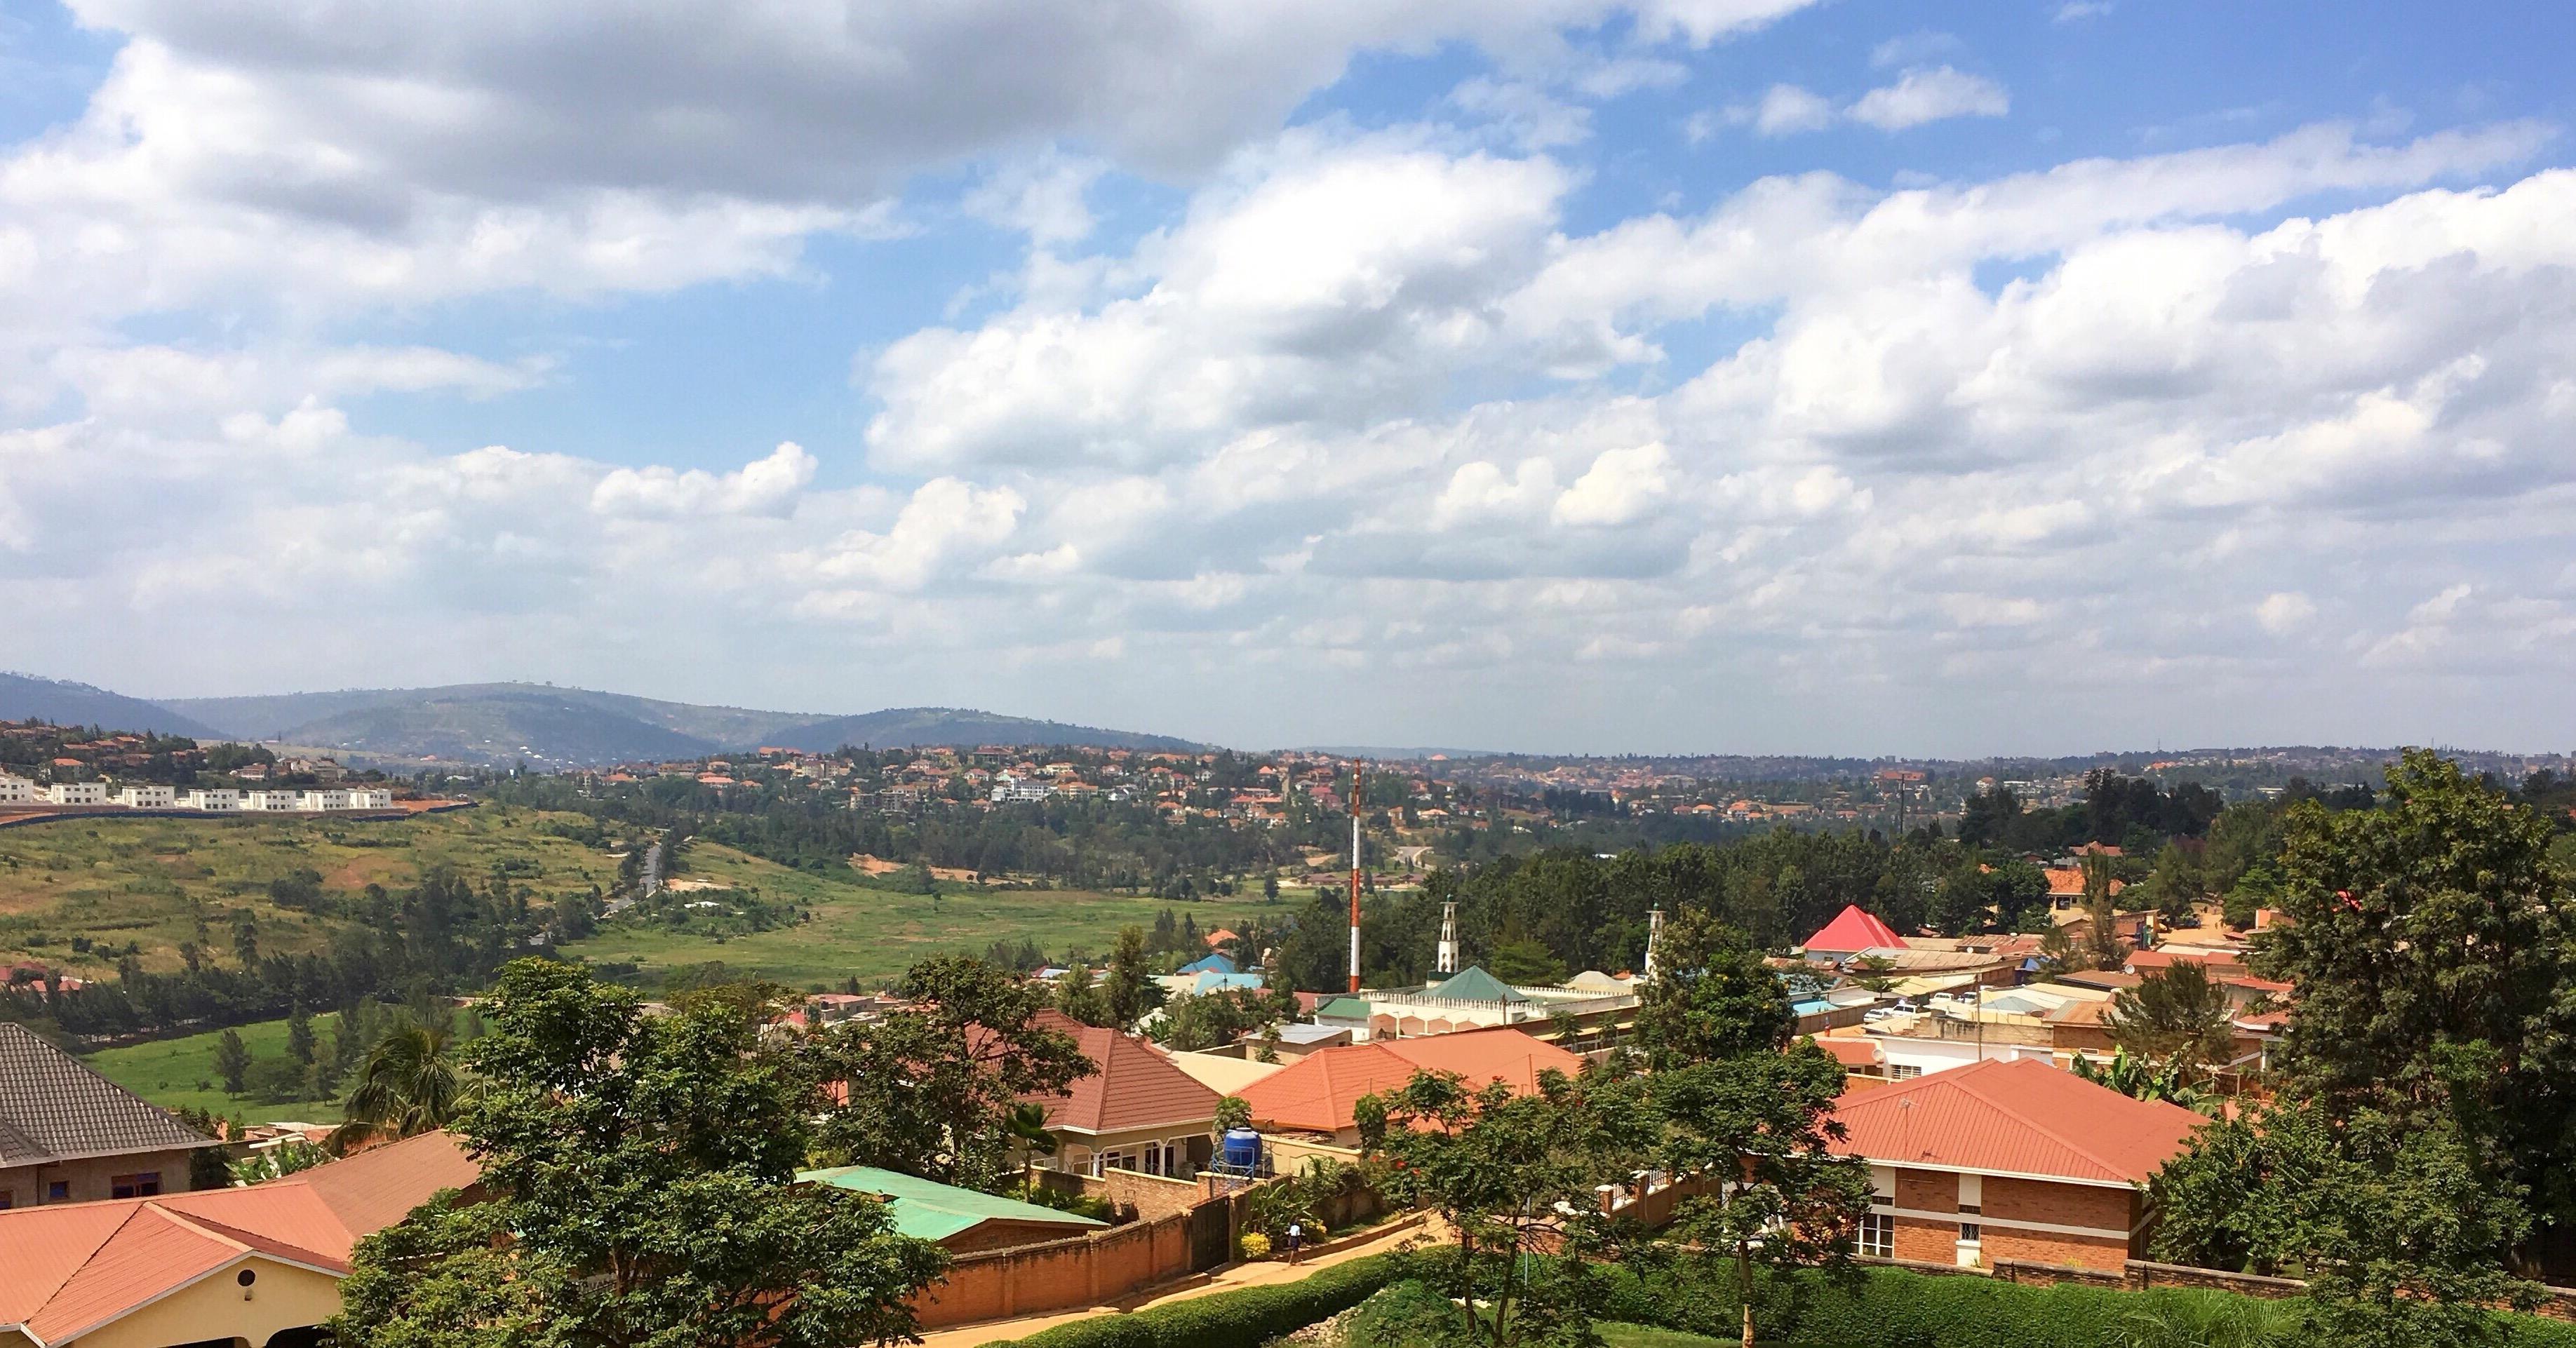 Photo Credit: Eliza Campbell - Kigali, Rwanda